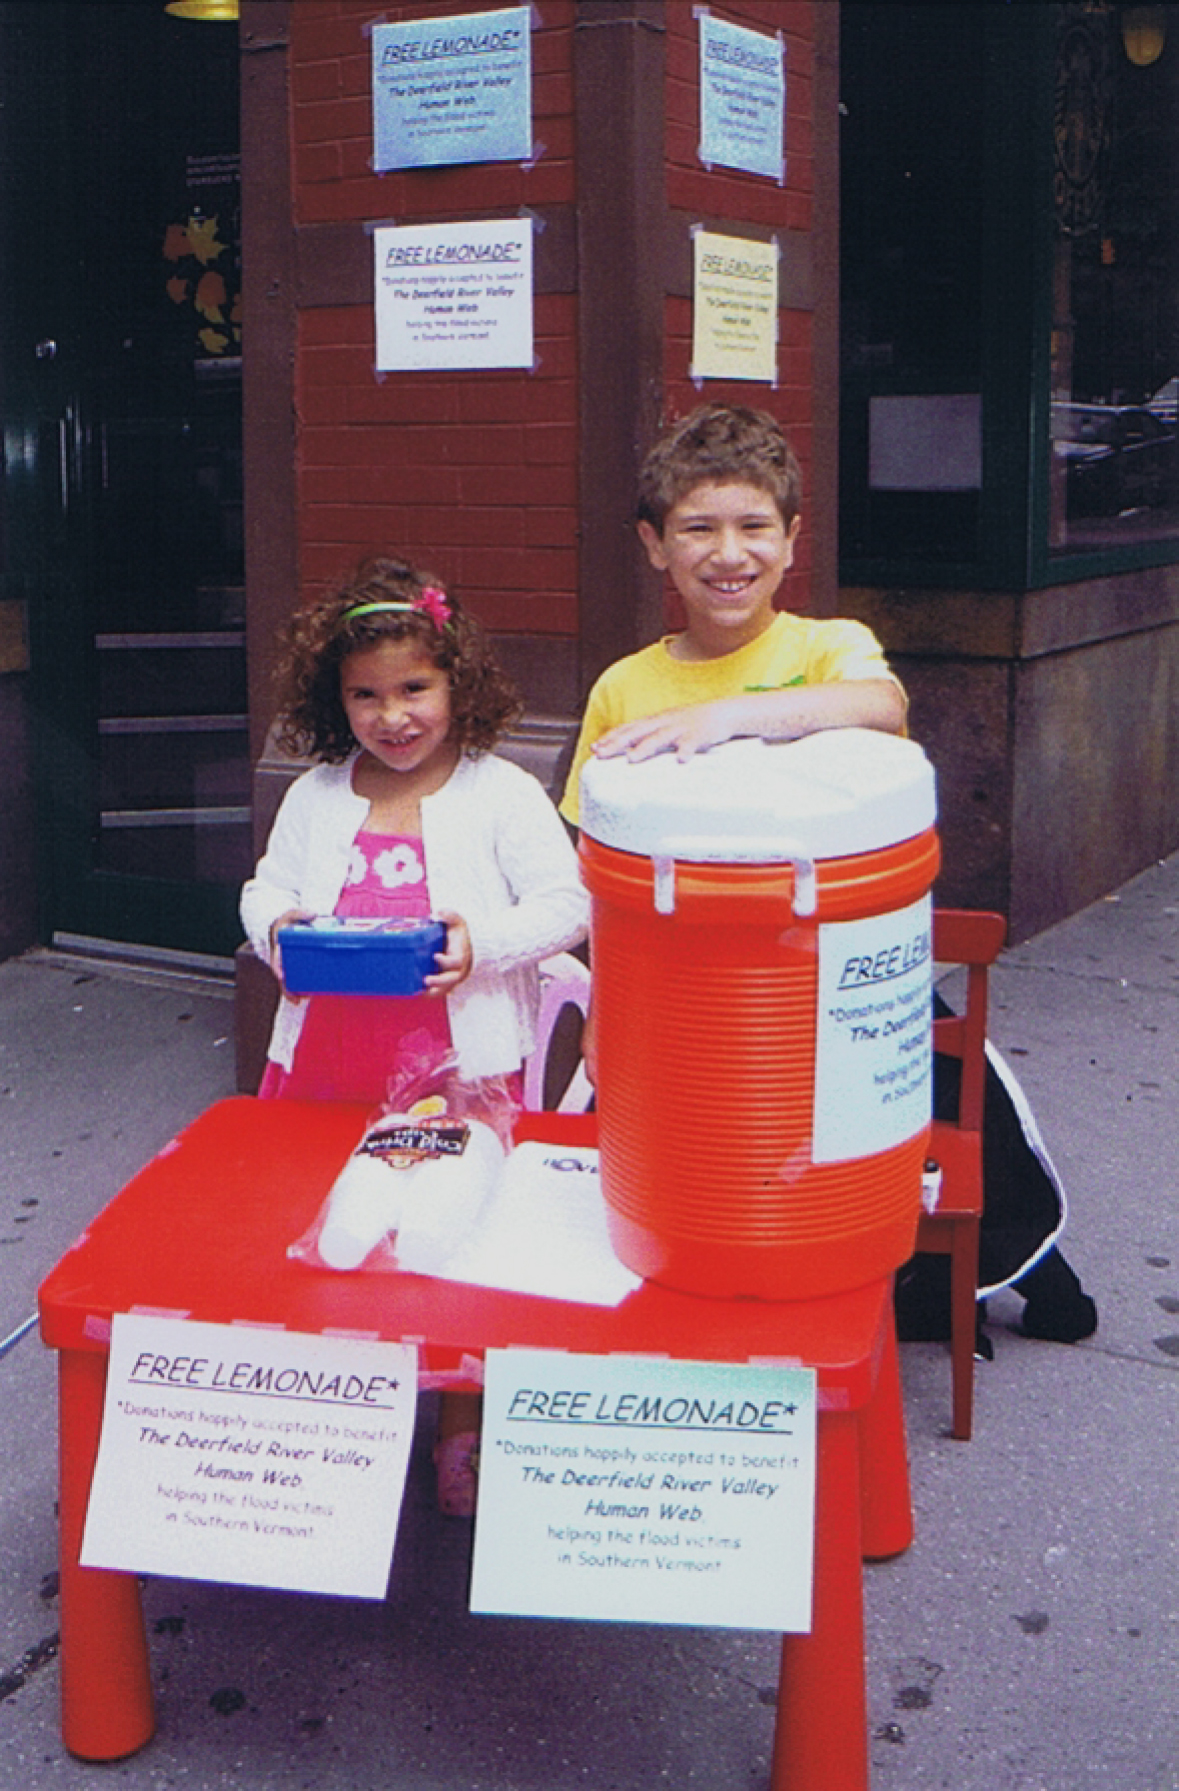 Kids donating lemonade profits to flood recovery